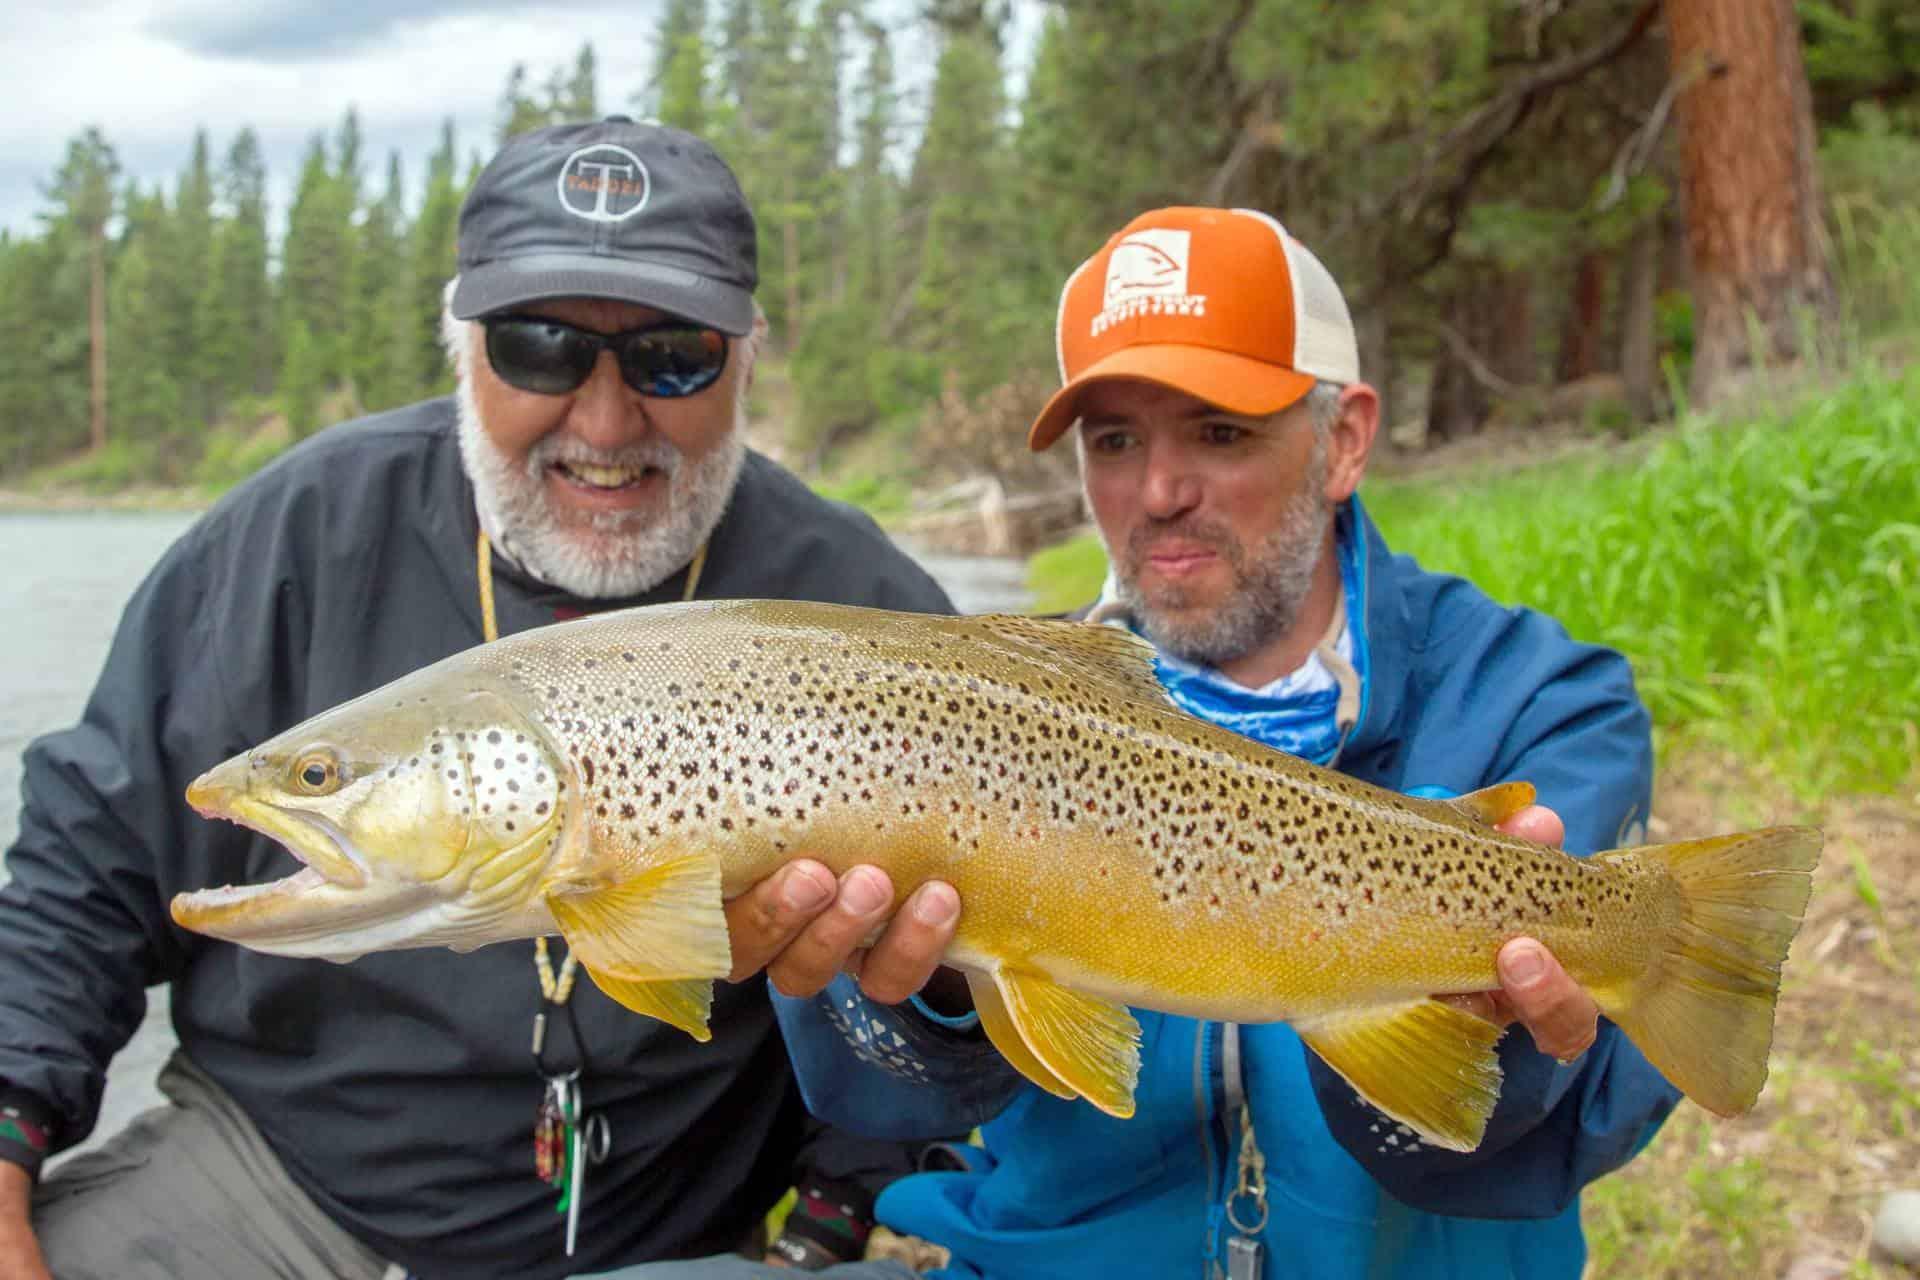 Blackfoot River Fly Fishing Guides